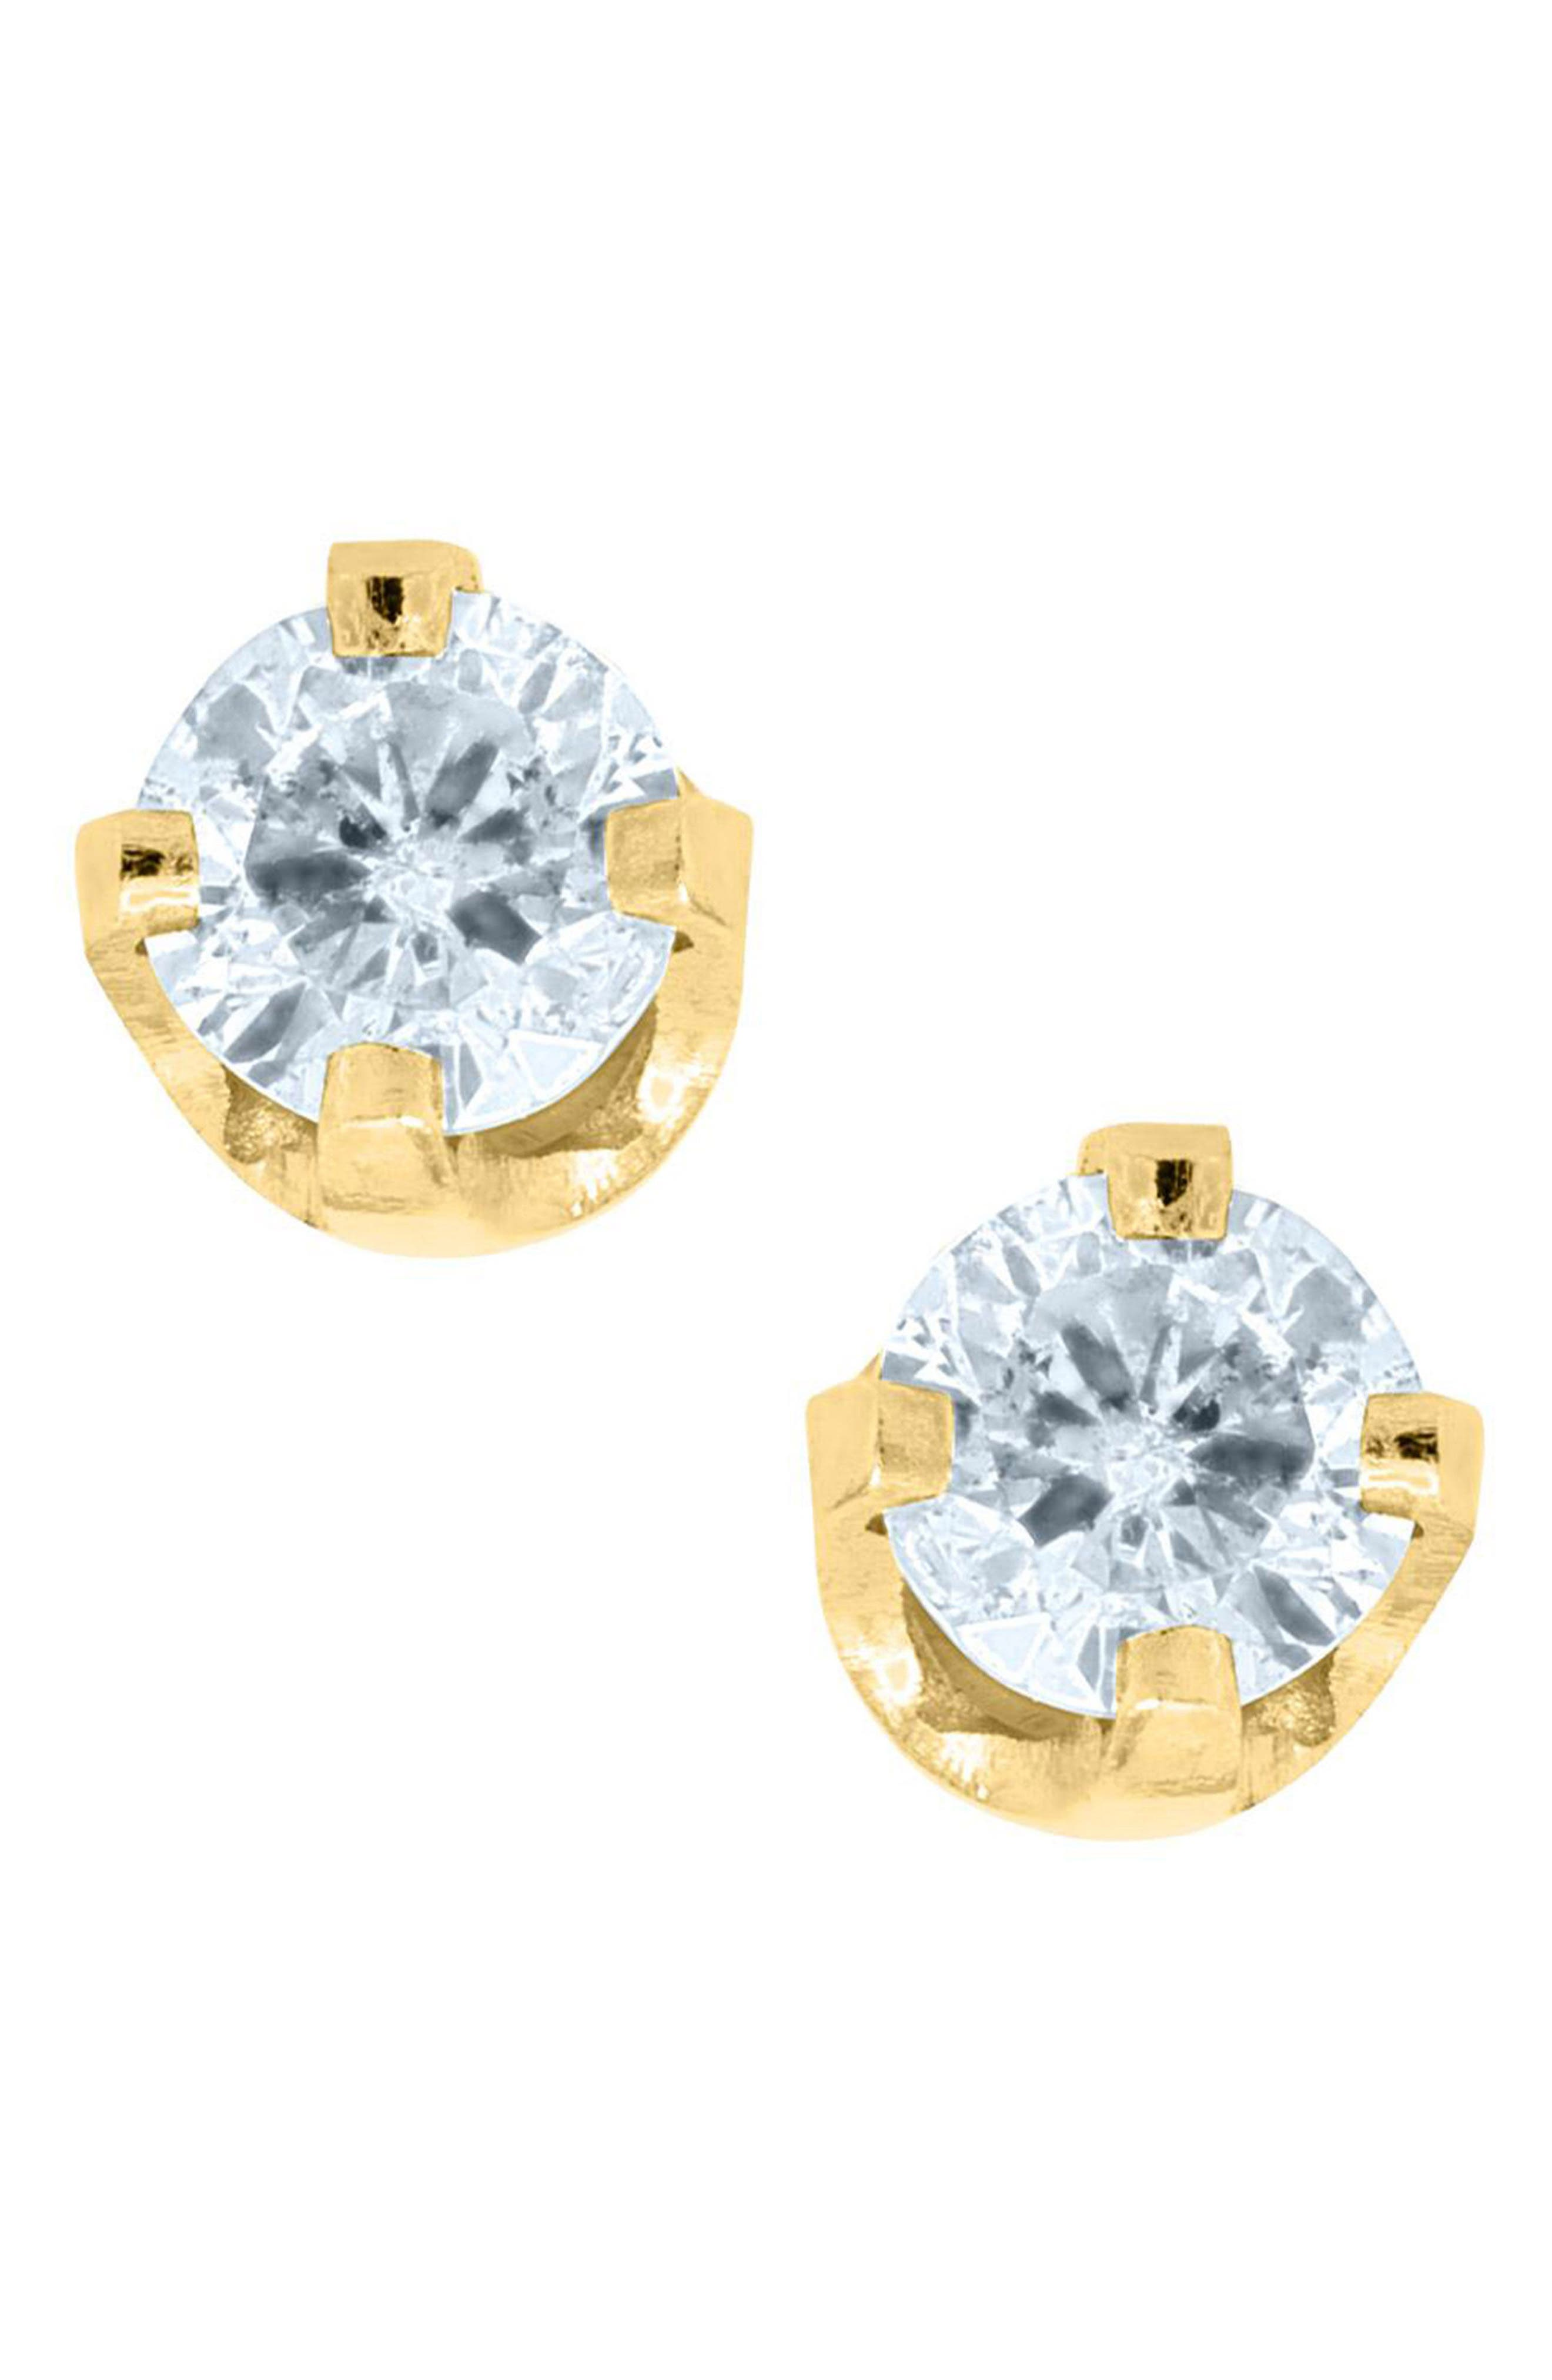 14k Gold & Diamond Earrings,                             Main thumbnail 1, color,                             Gold